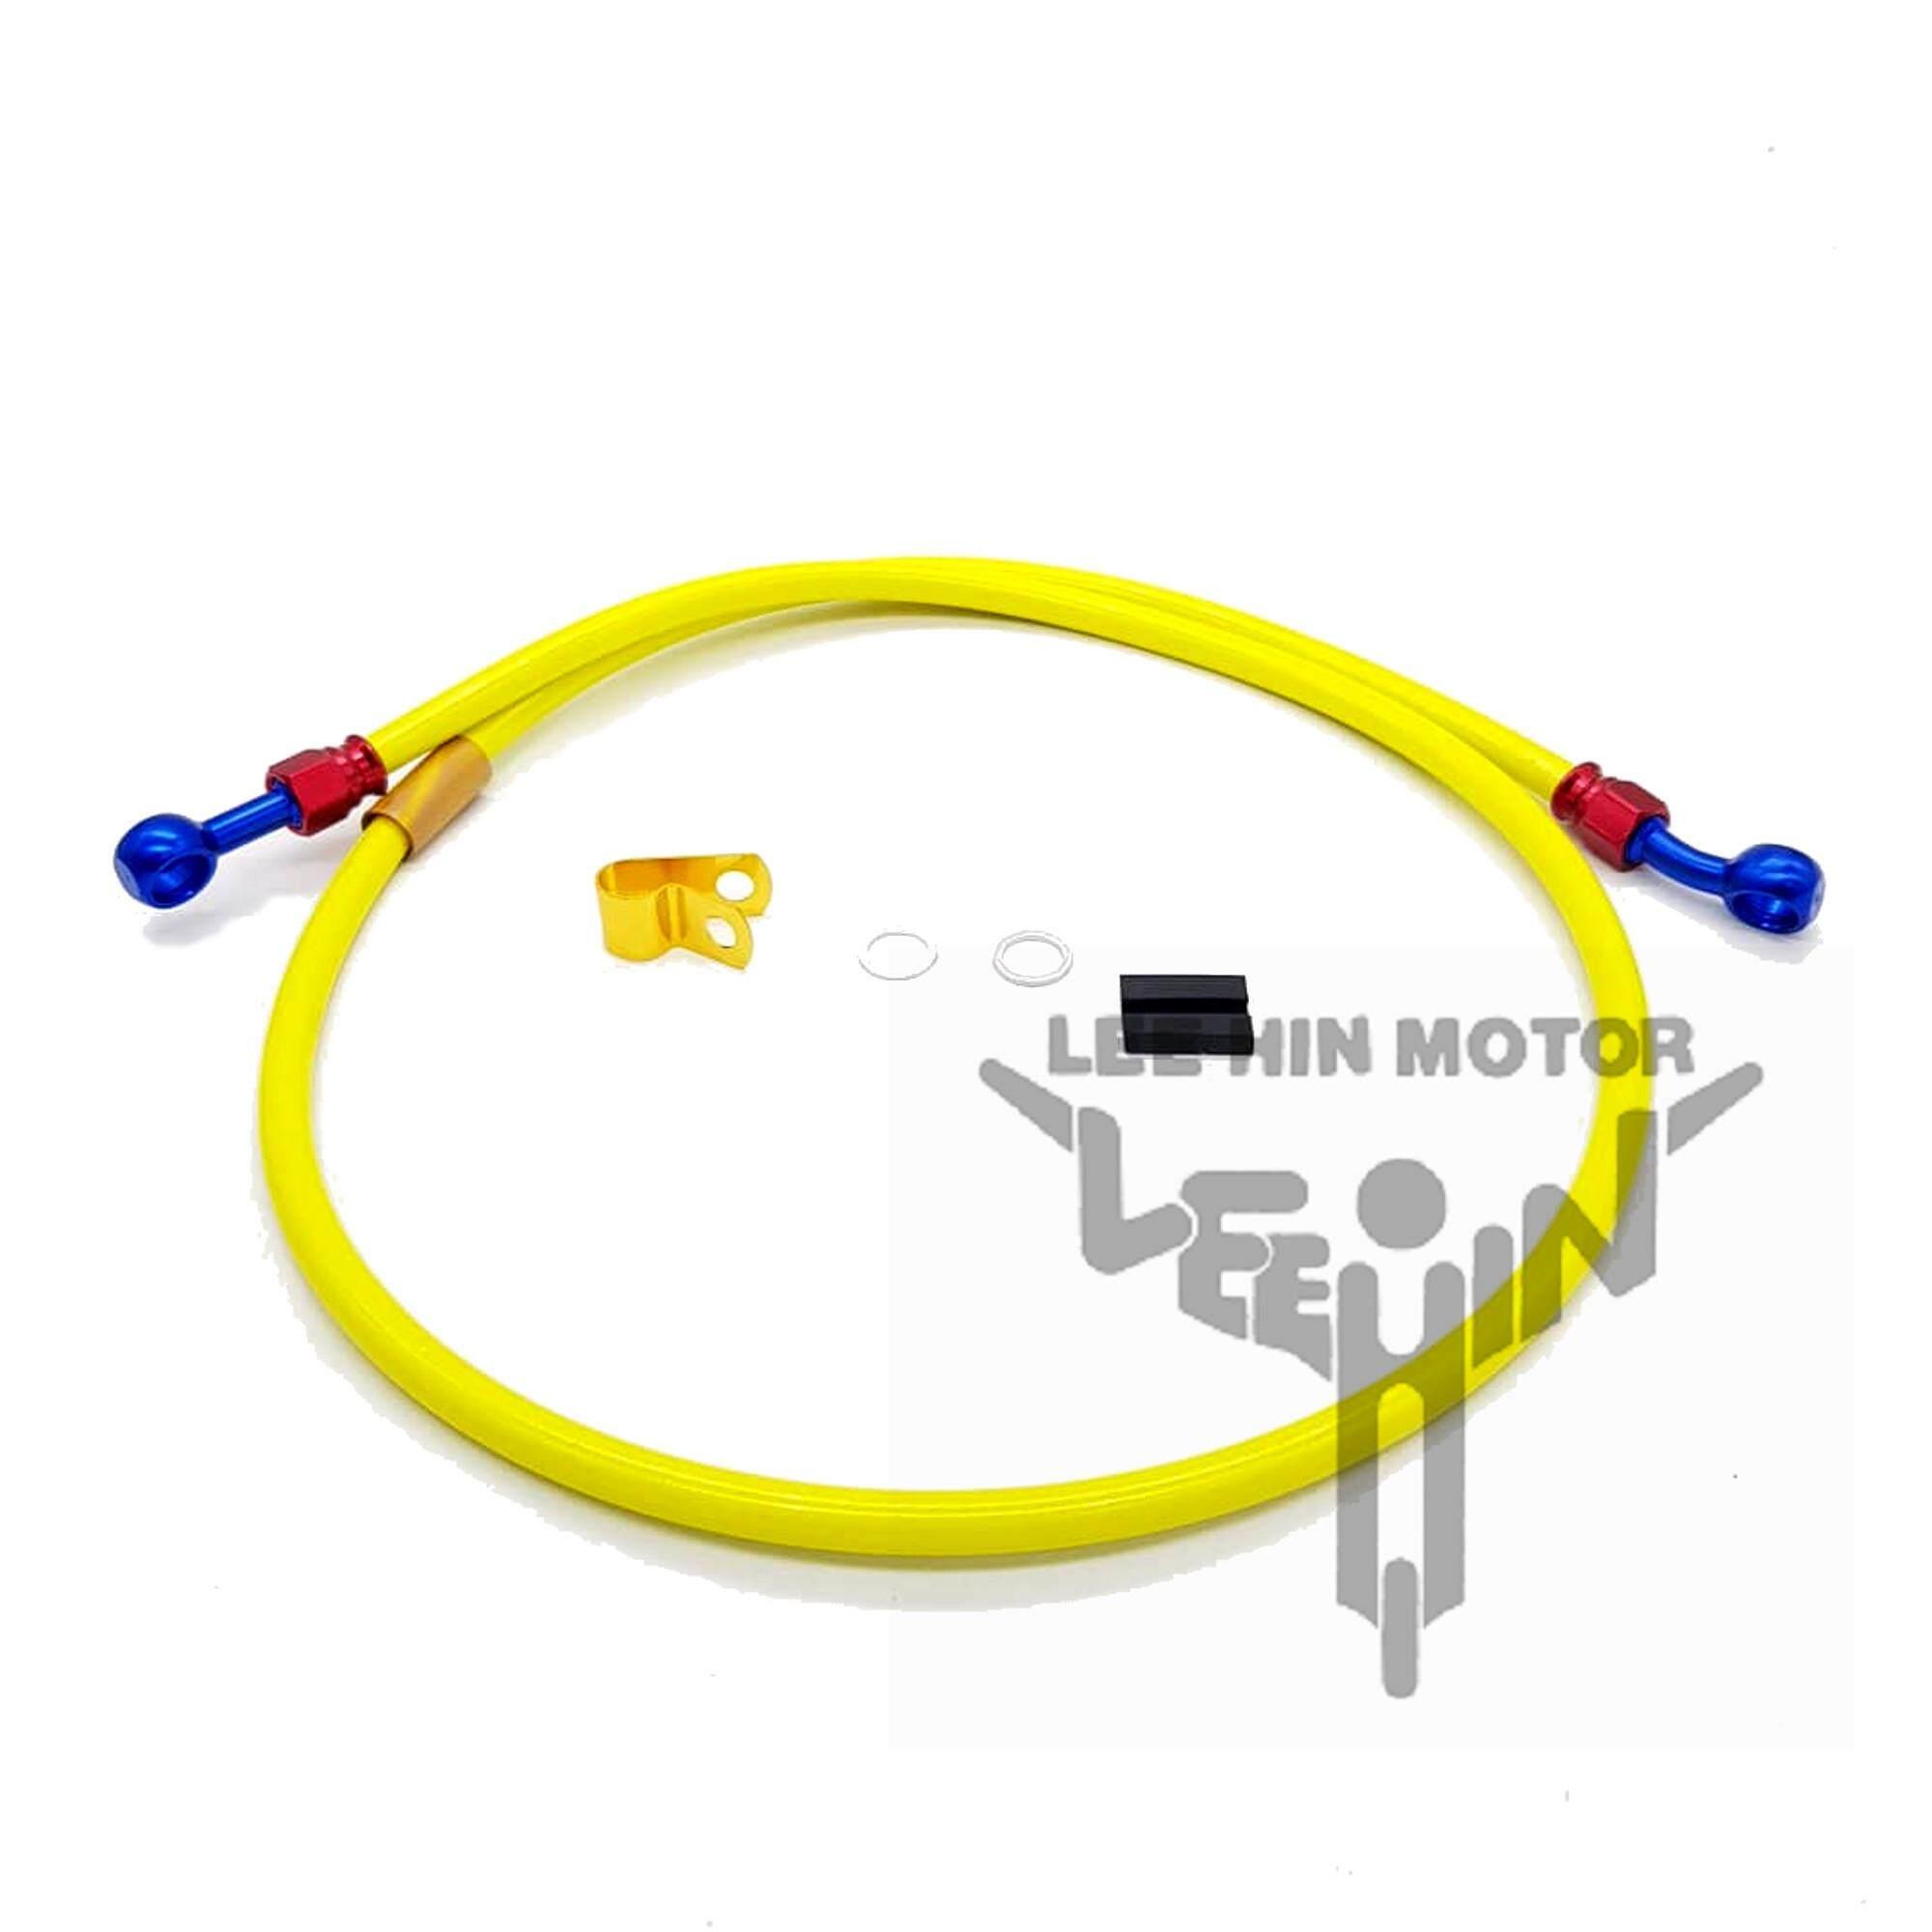 Morin High Performance Brake Hose 100cm / 50cm ( Yellow ), 100cm